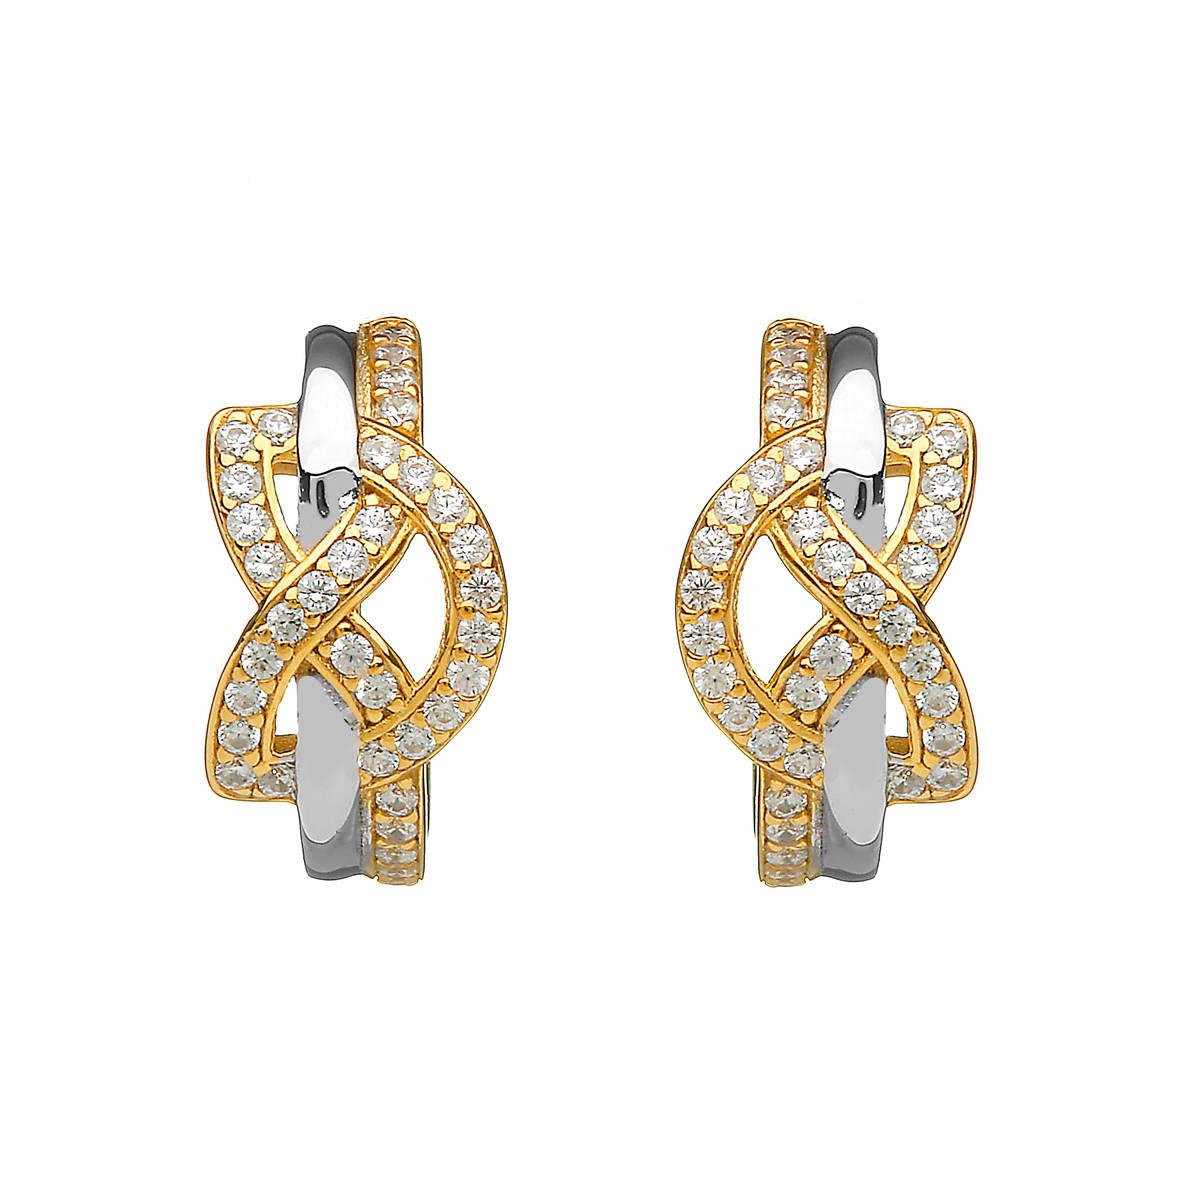 Silver Cz Two Tone Love Knot Huggy Stud Earrings